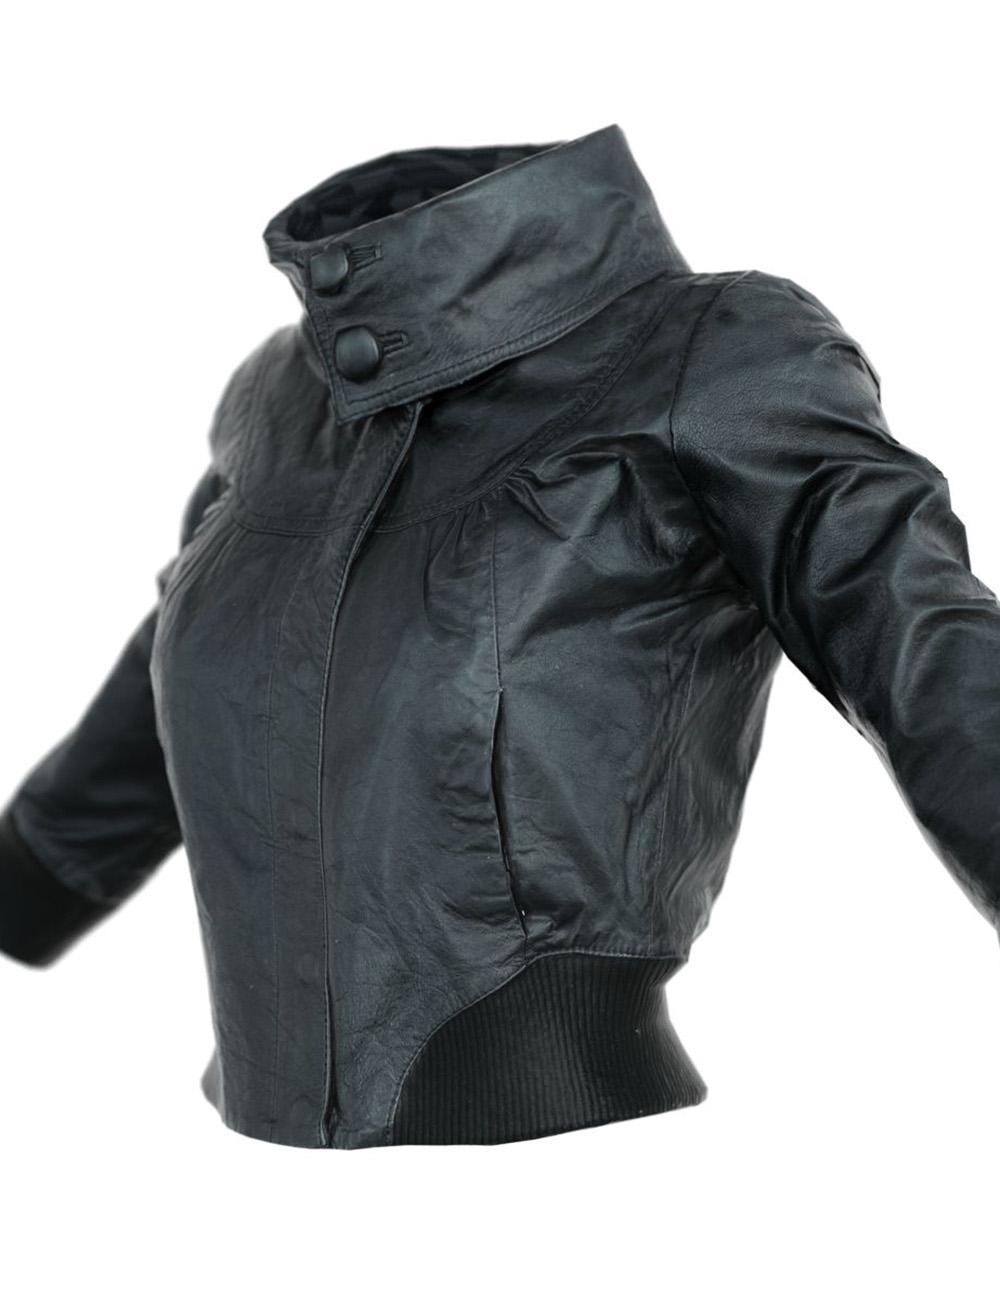 FBX- Black Leather Jacket by: Polygonal Miniatures, 3D Models by Daz 3D